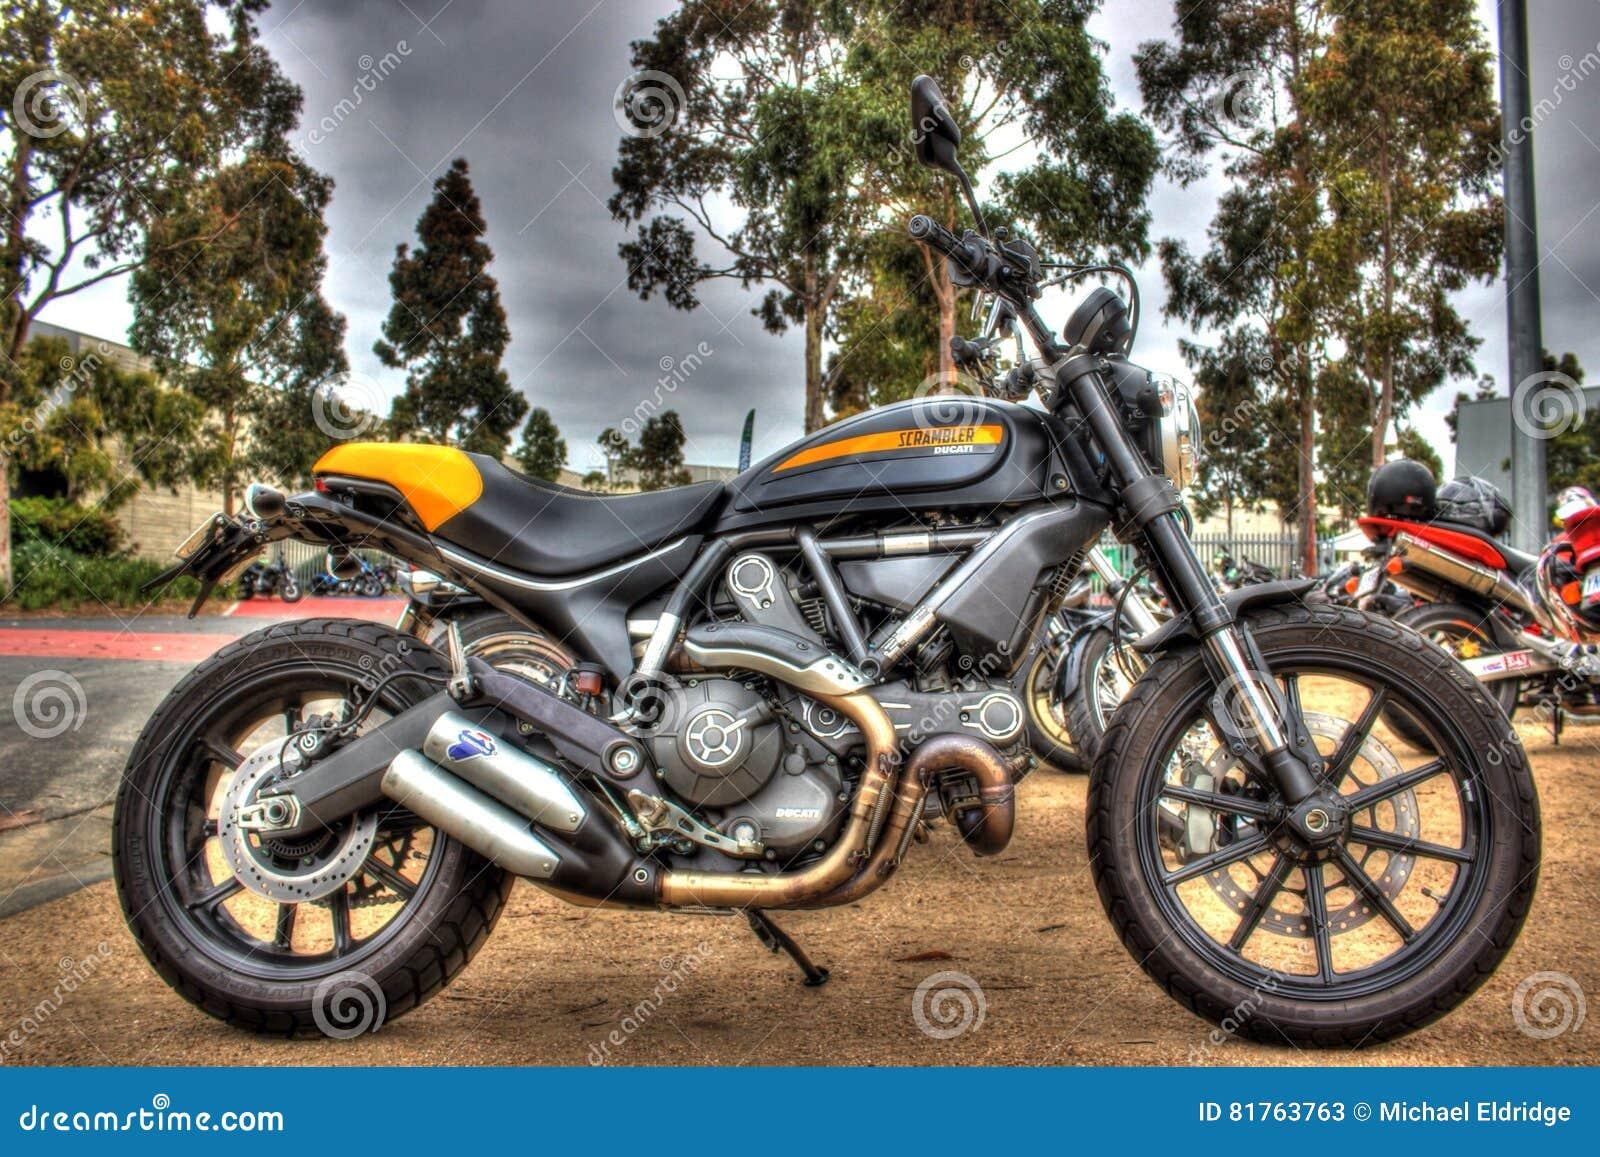 Modern Italian Made Ducati Motorcycle